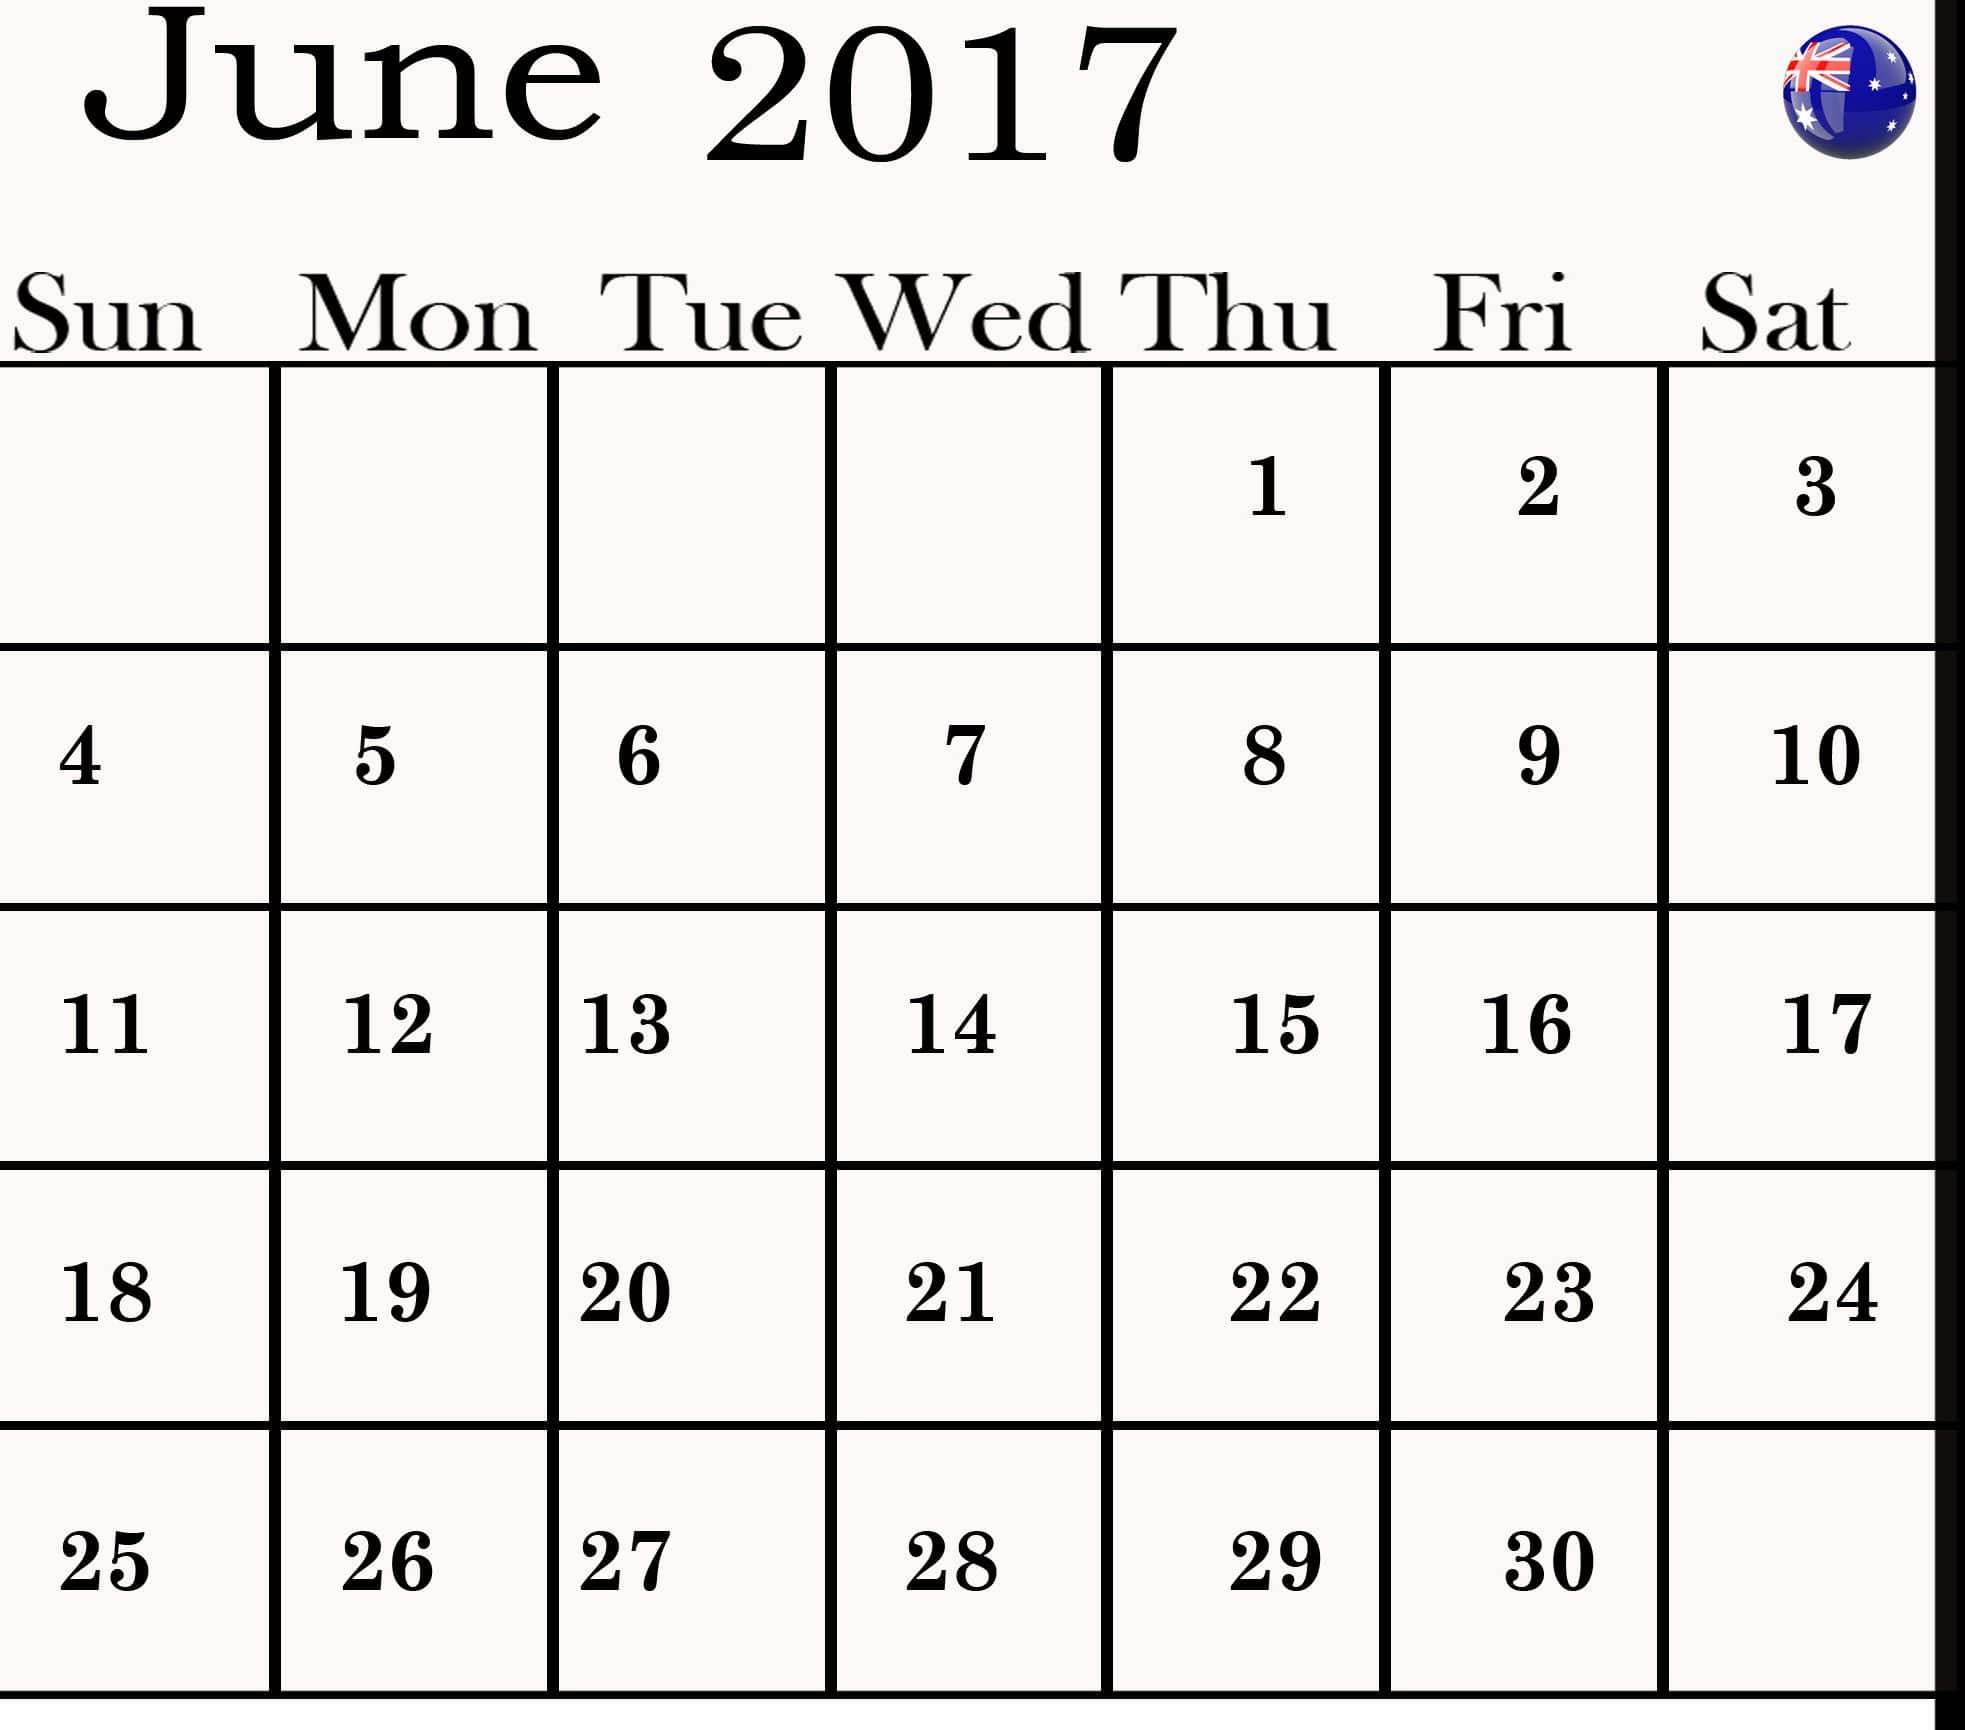 June 2017 calendar Australia Image